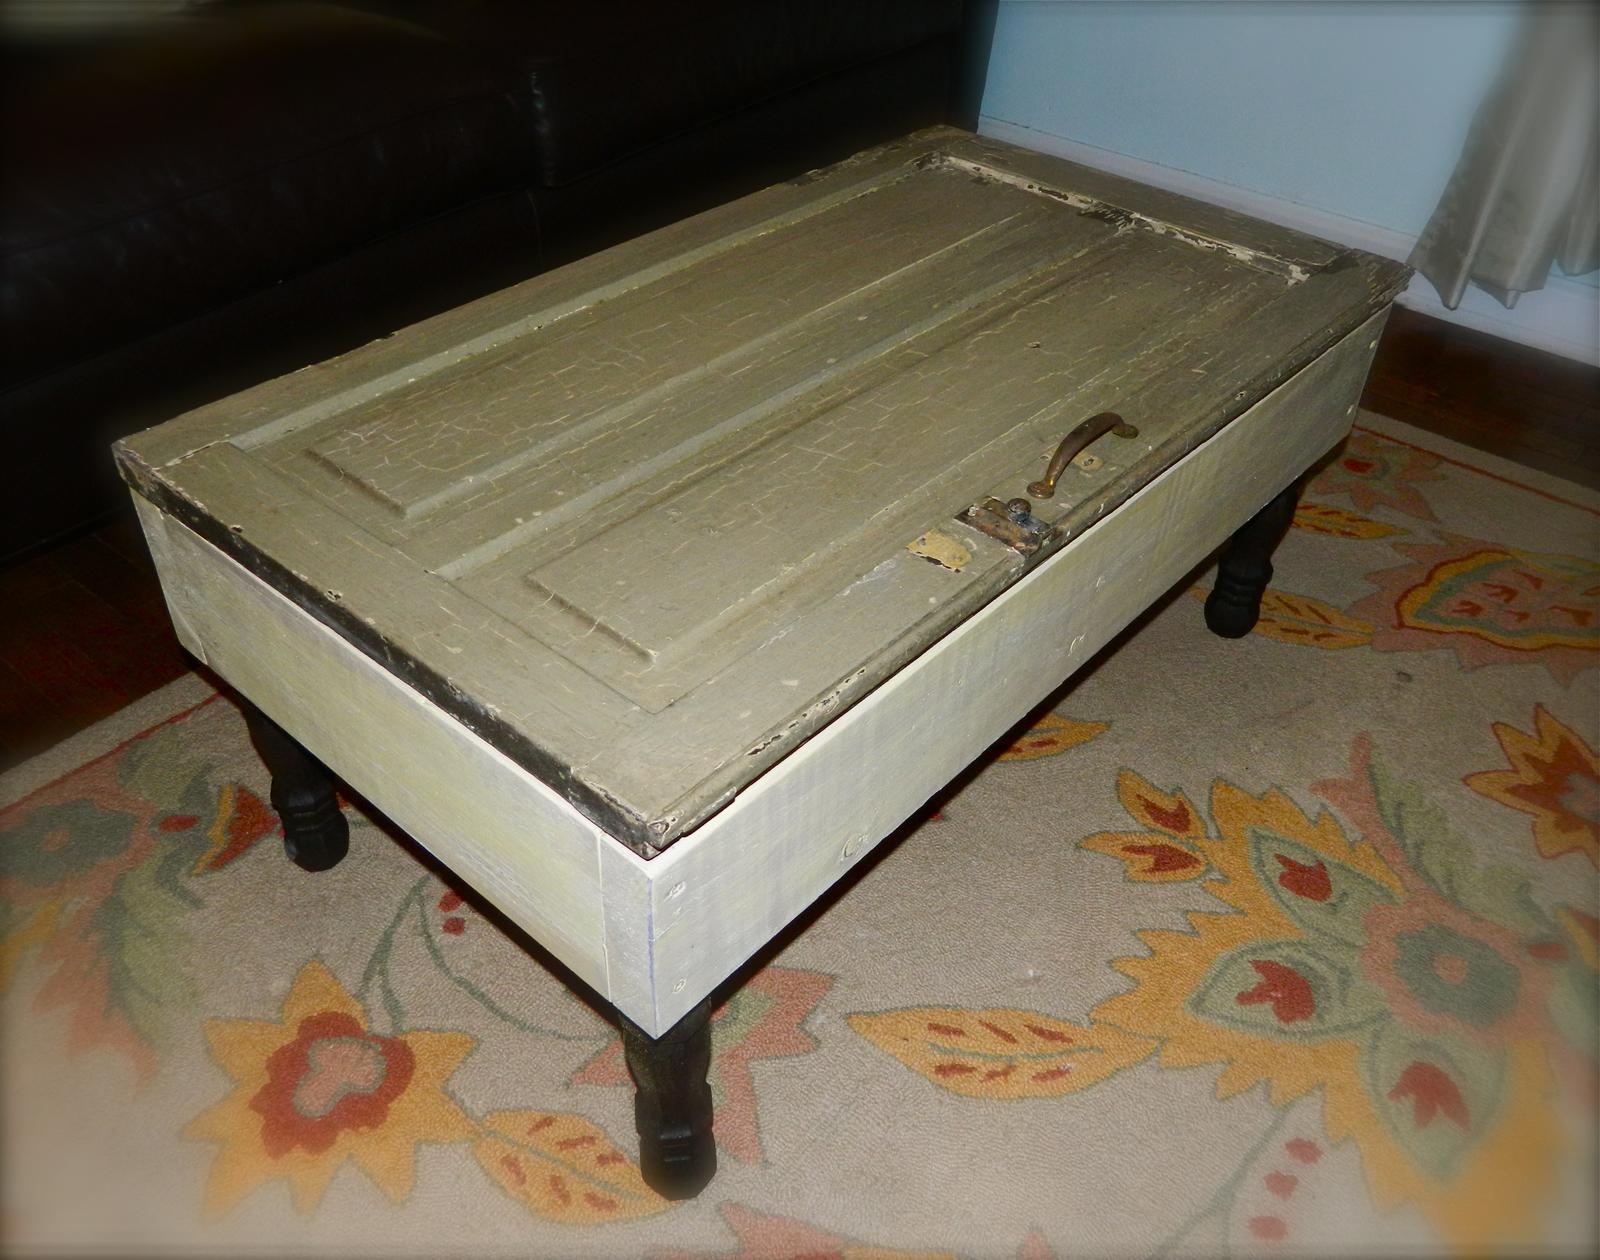 Repurposed Shabby Chic Furniture Just BCAUSE